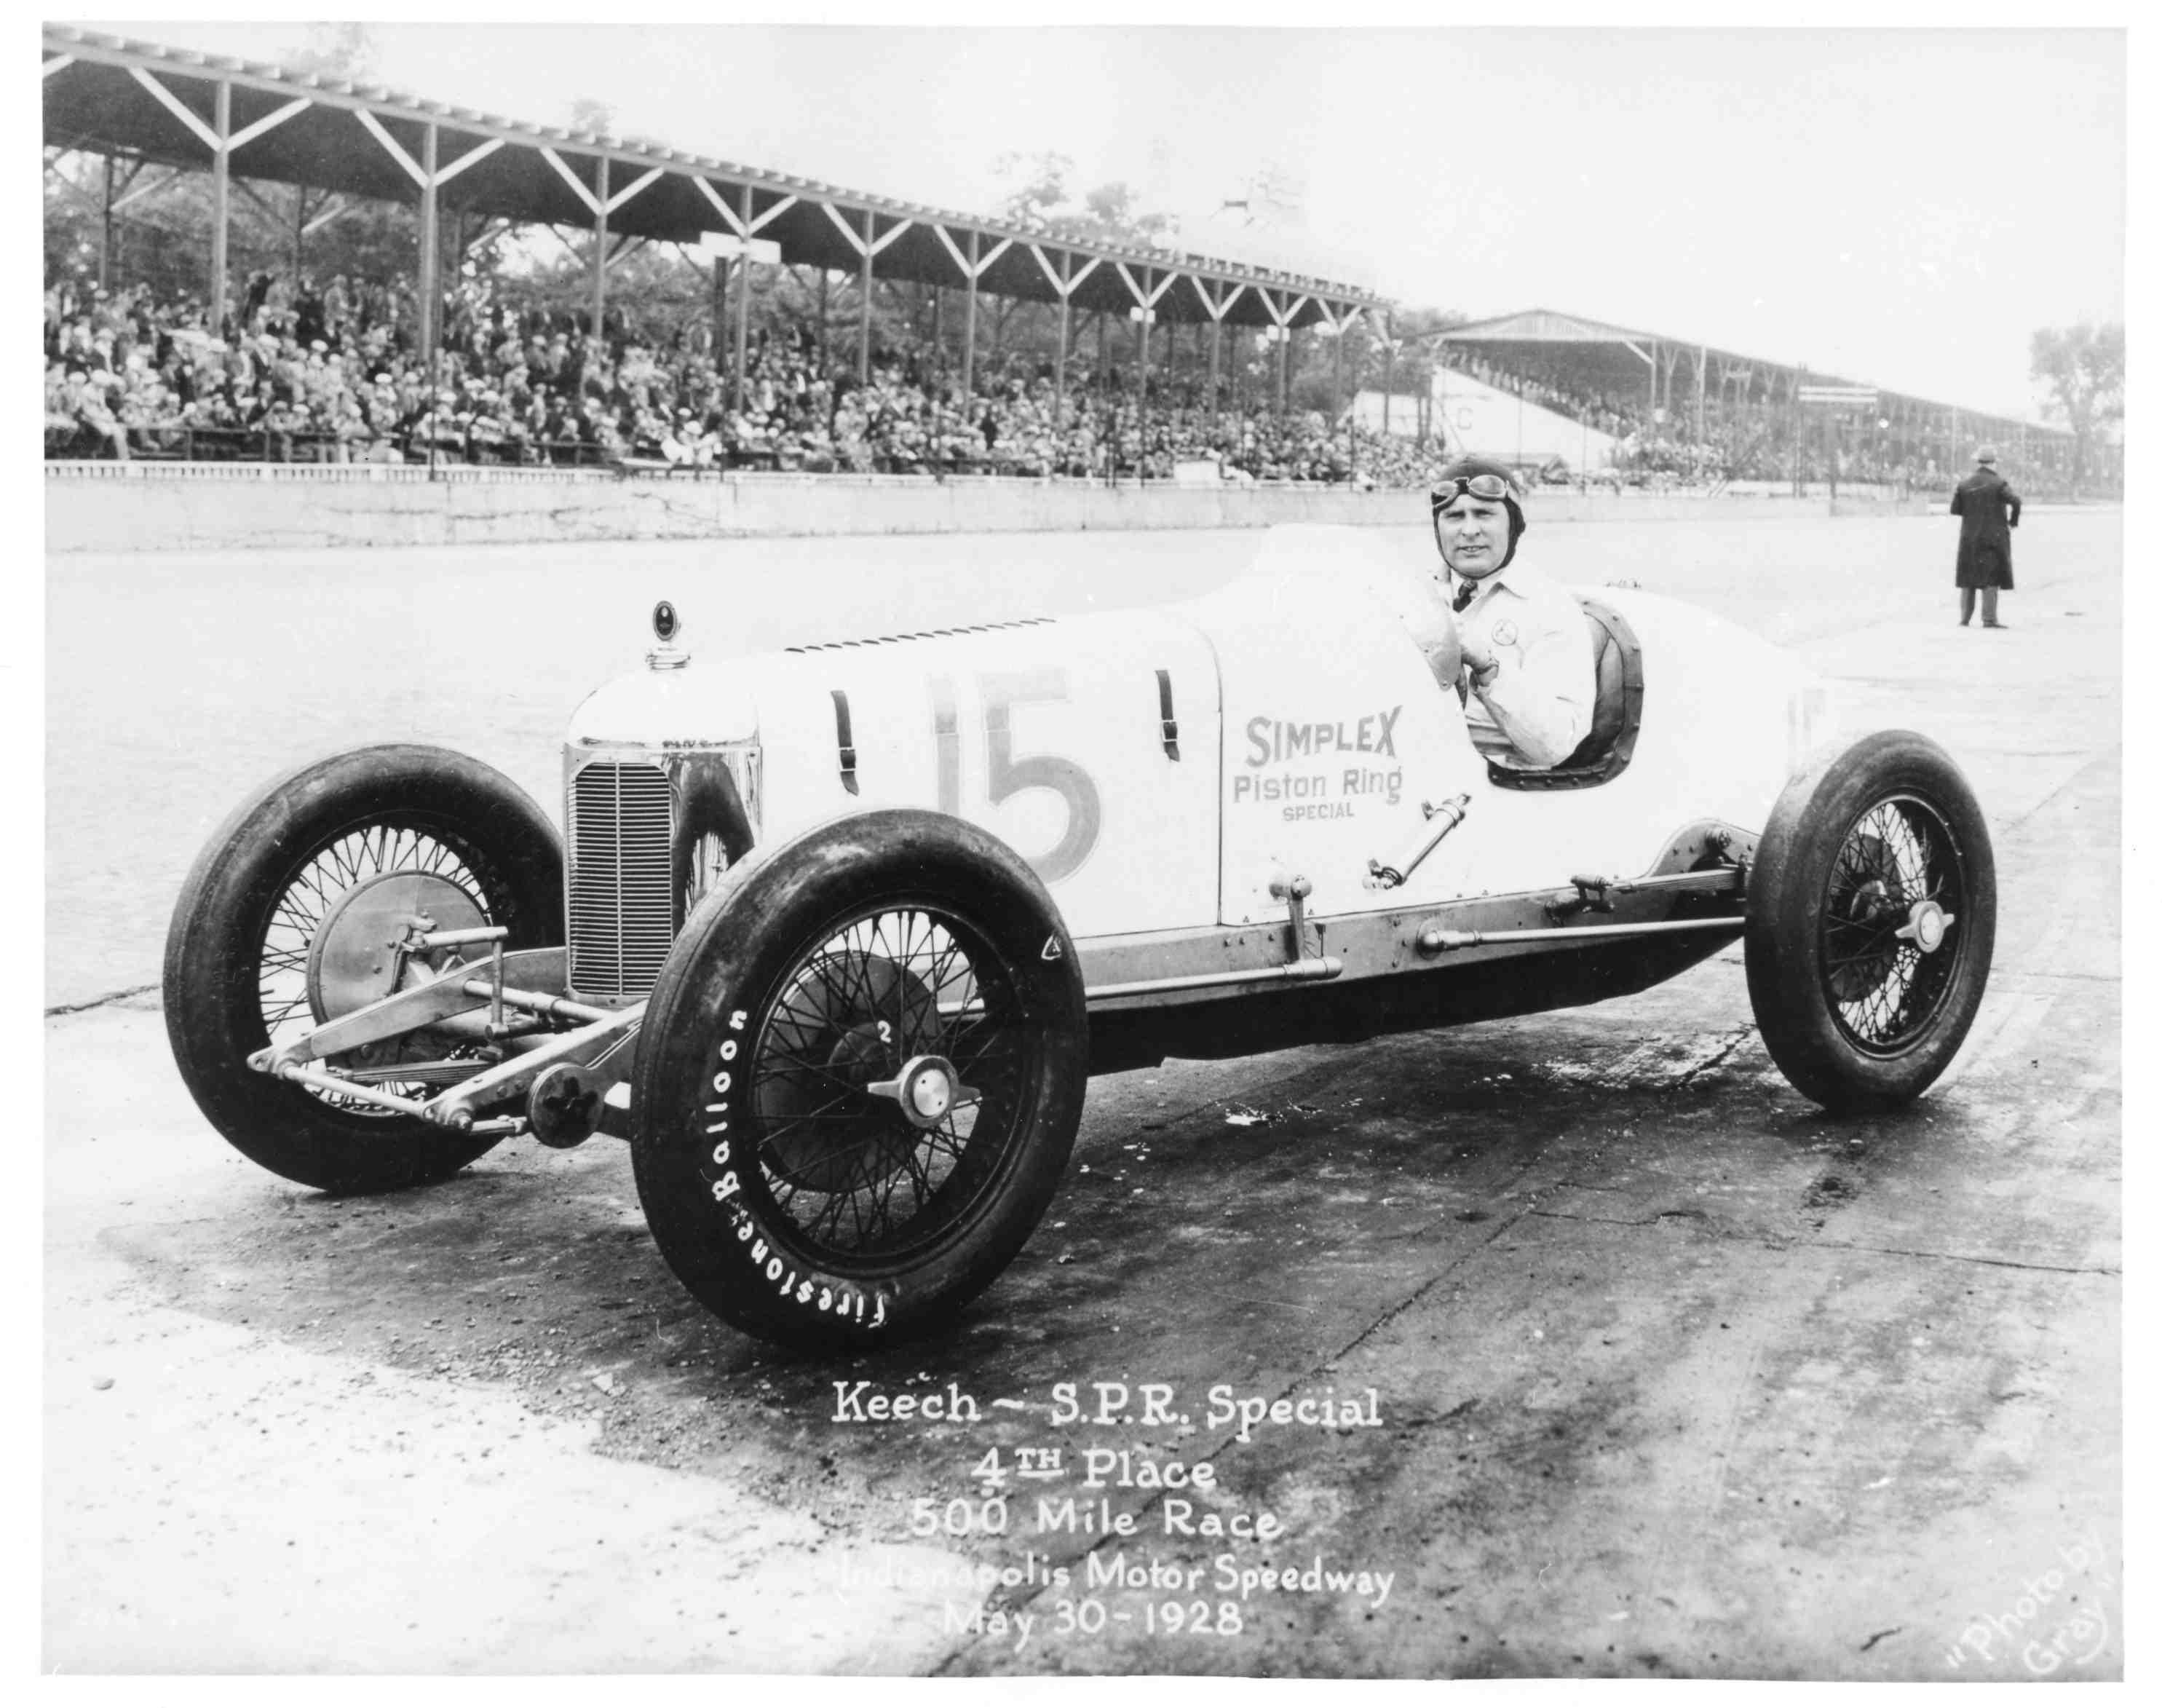 Indy Race Car Models